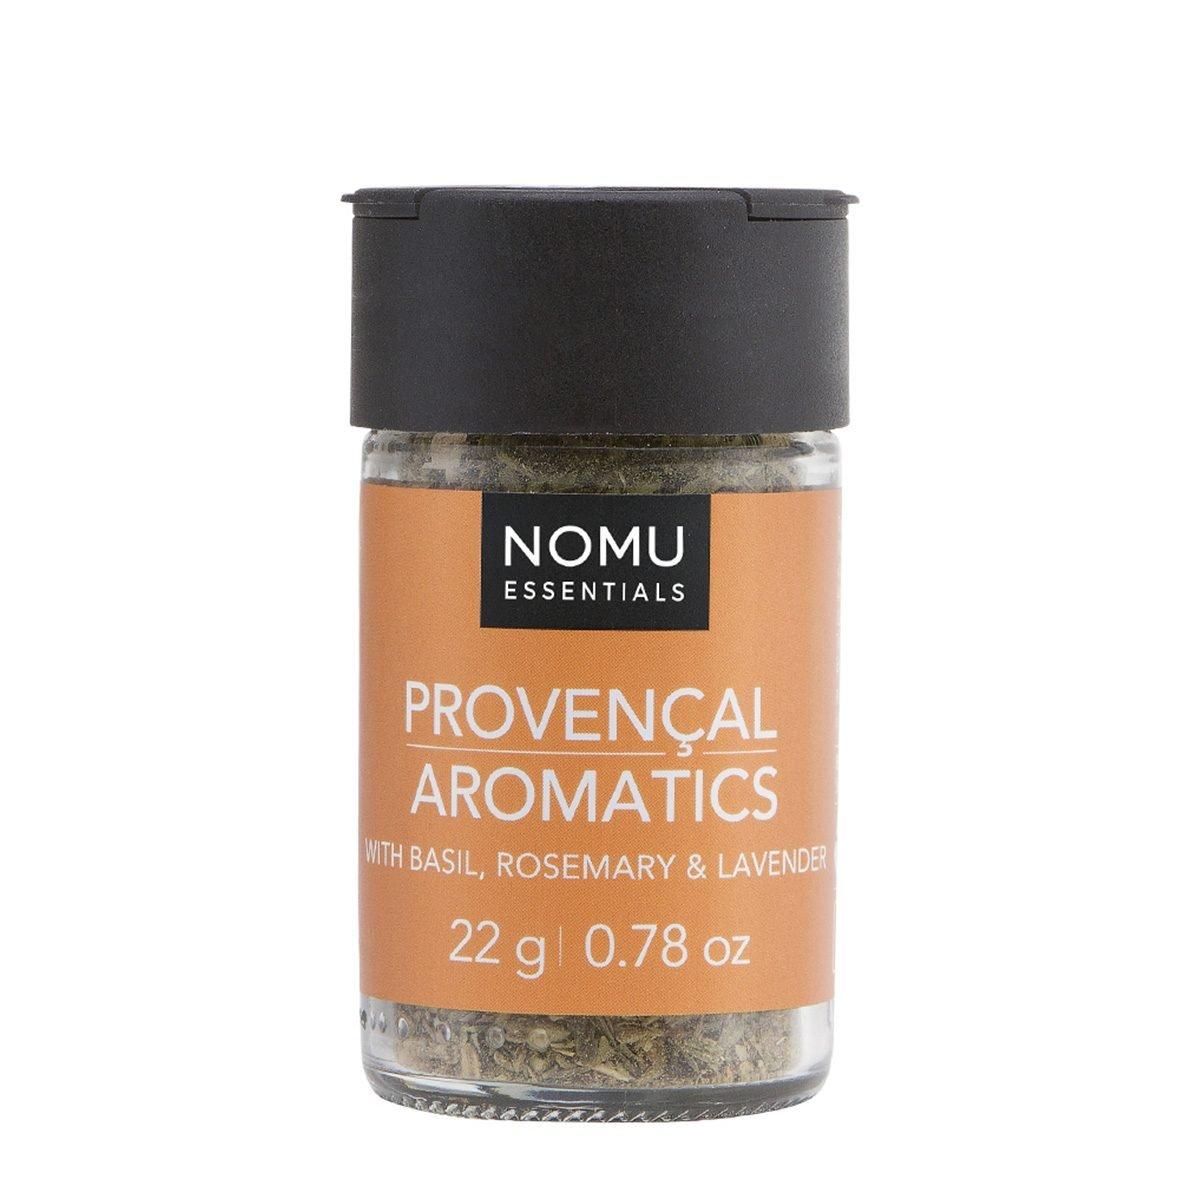 Provencal-Aromatics